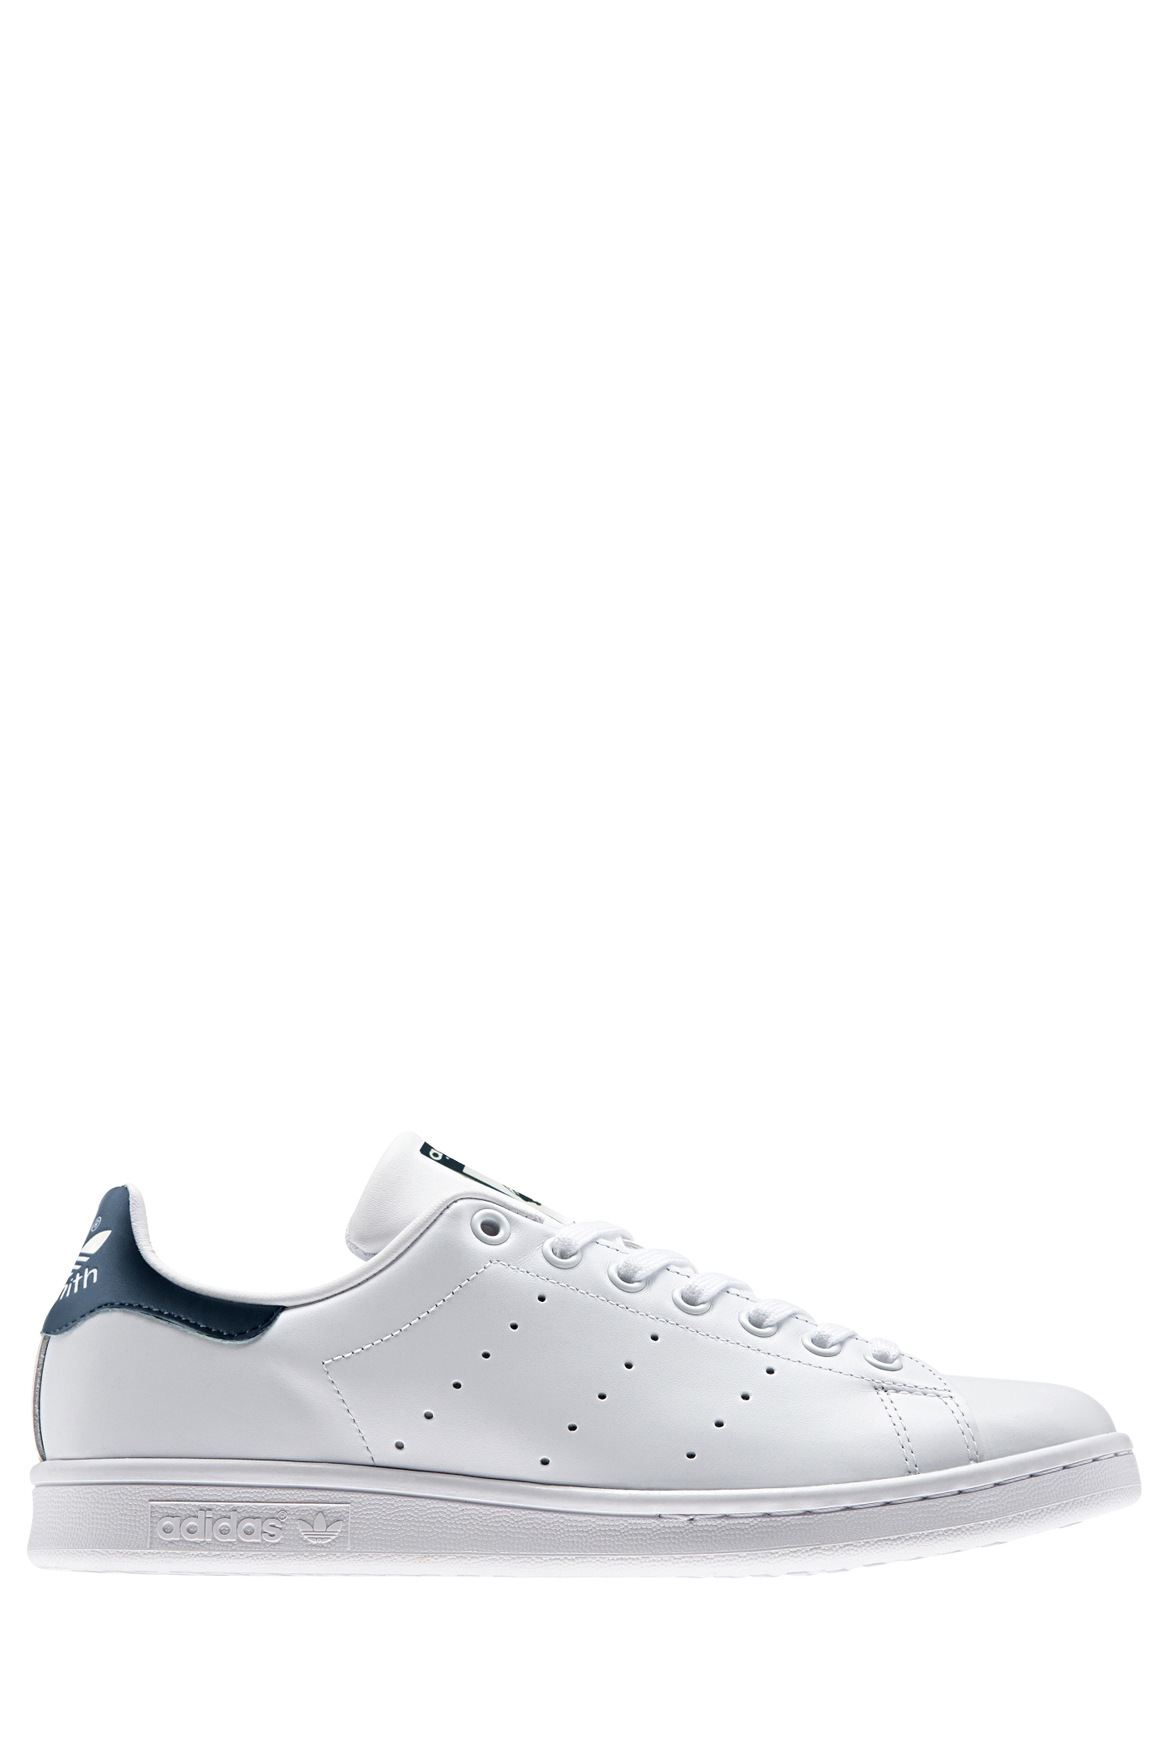 adidas stan smith scarpe myer online